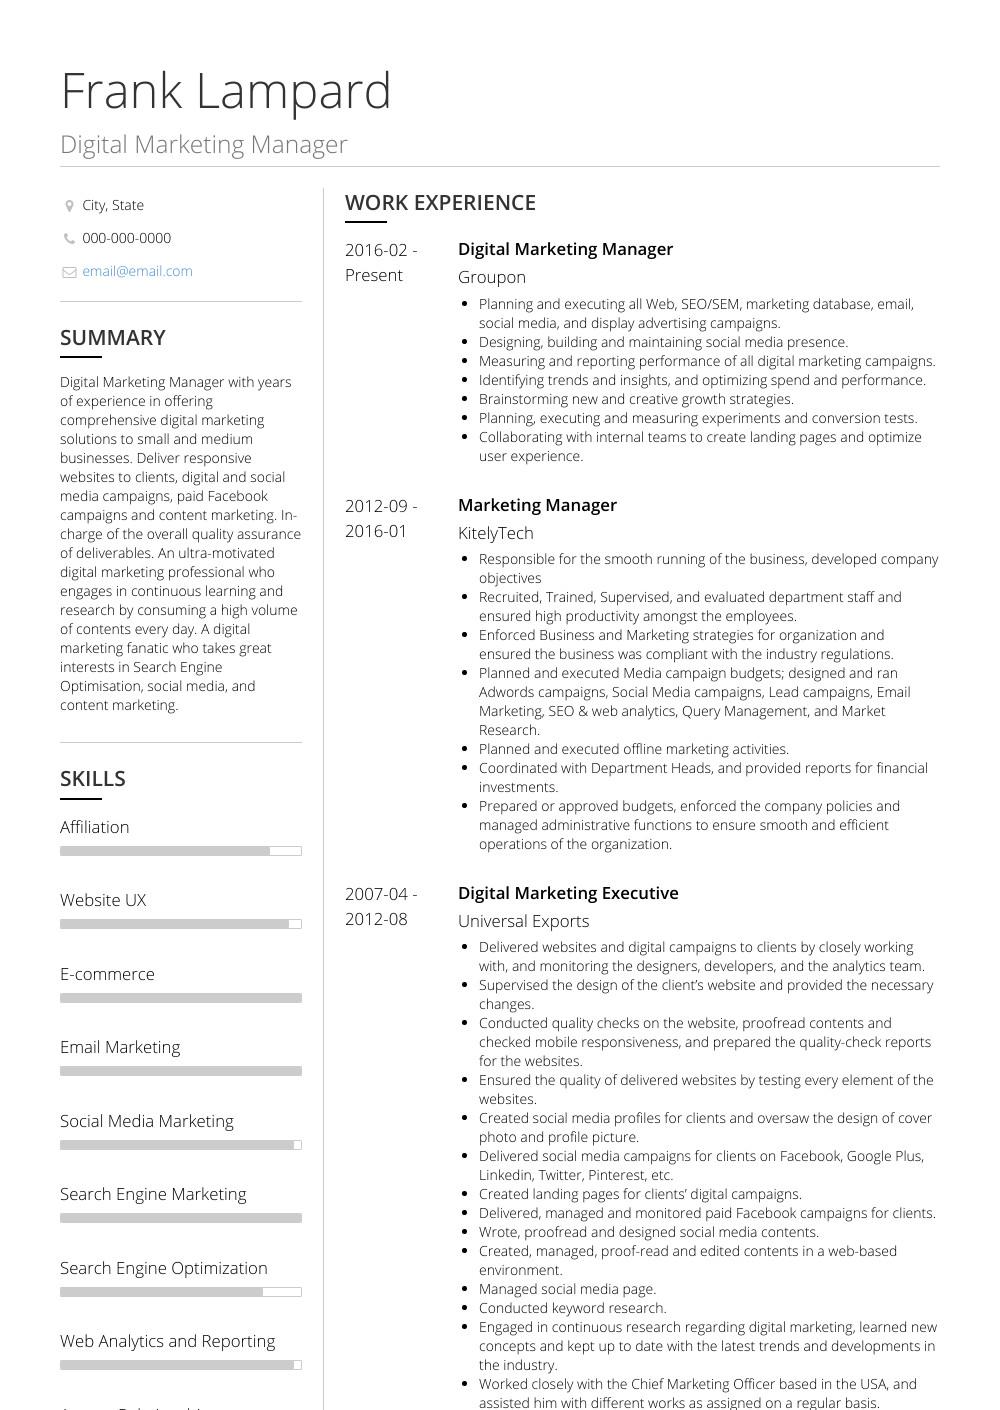 Digital Marketing Resume Sample Digital Marketing Manager Resume Samples & Templates